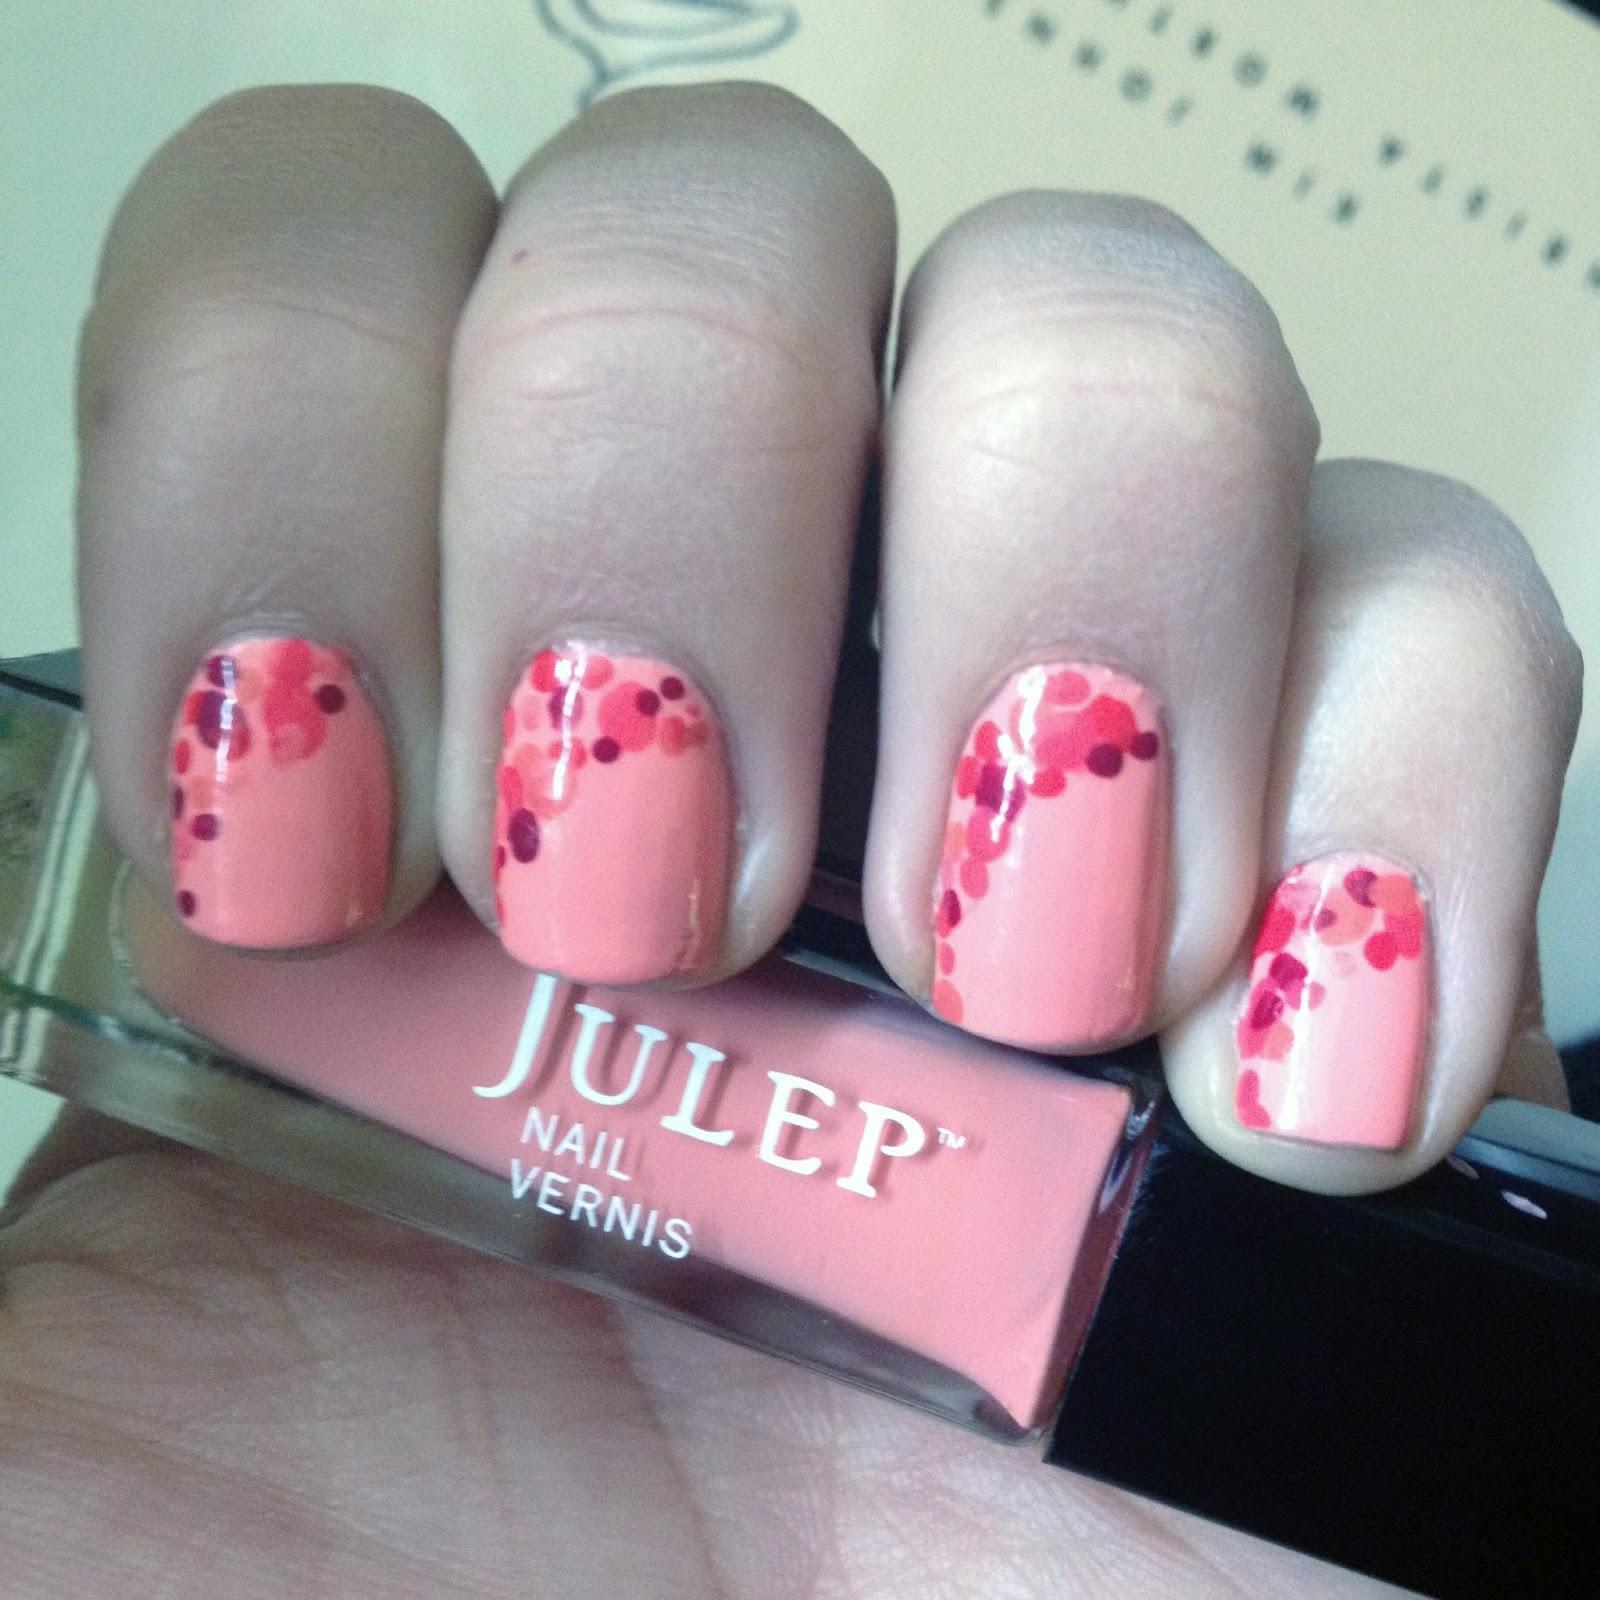 Top five ibittm manicures of 2012